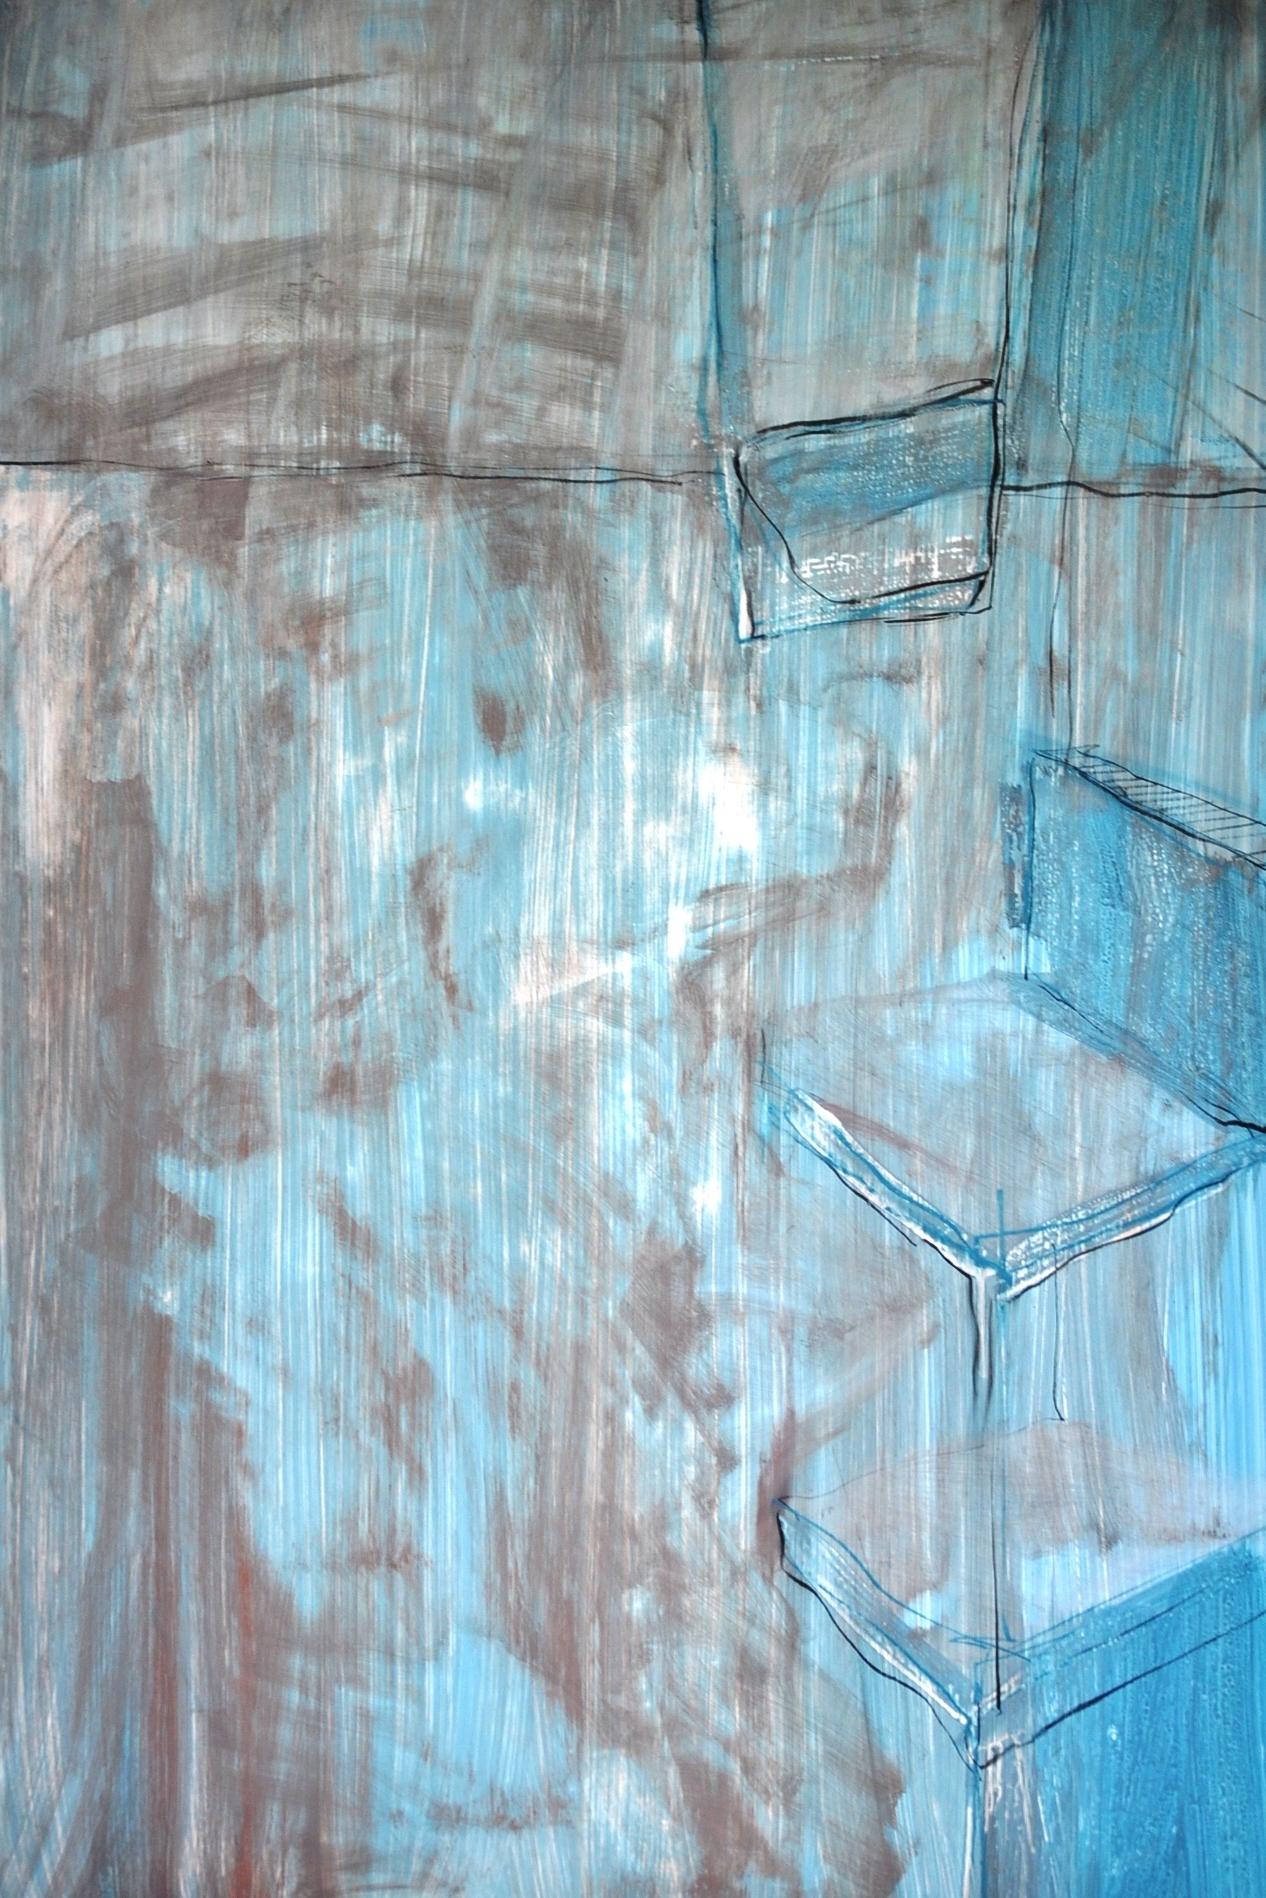 acryl, papier, grootte (b x h): 80 cm x 110 cm, aluminium wissellijst, oplage:1, prijs: € 550